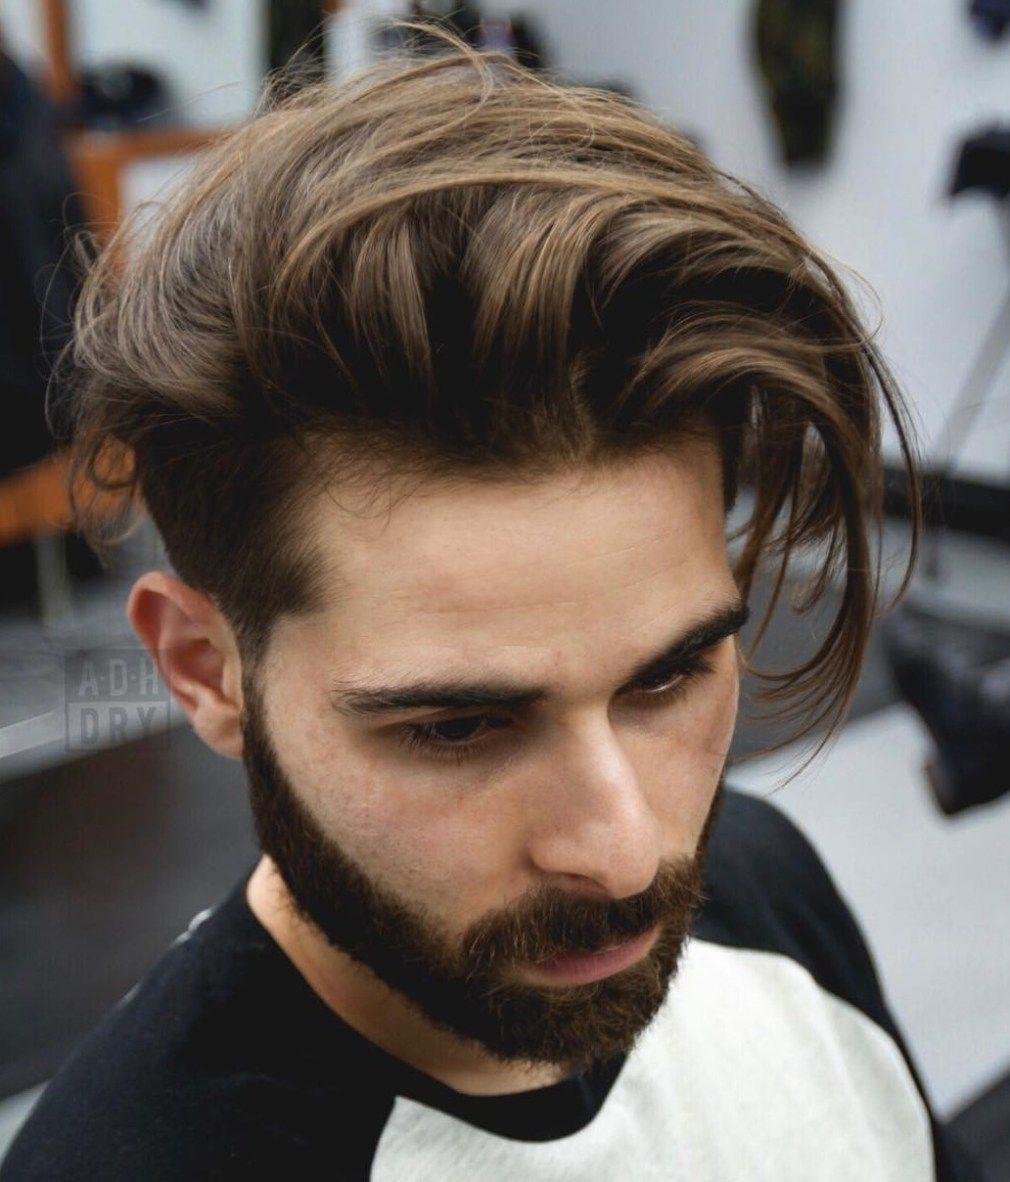 Menus Long Undercut Haircut  Hairstyles  Pinterest  Hair styles